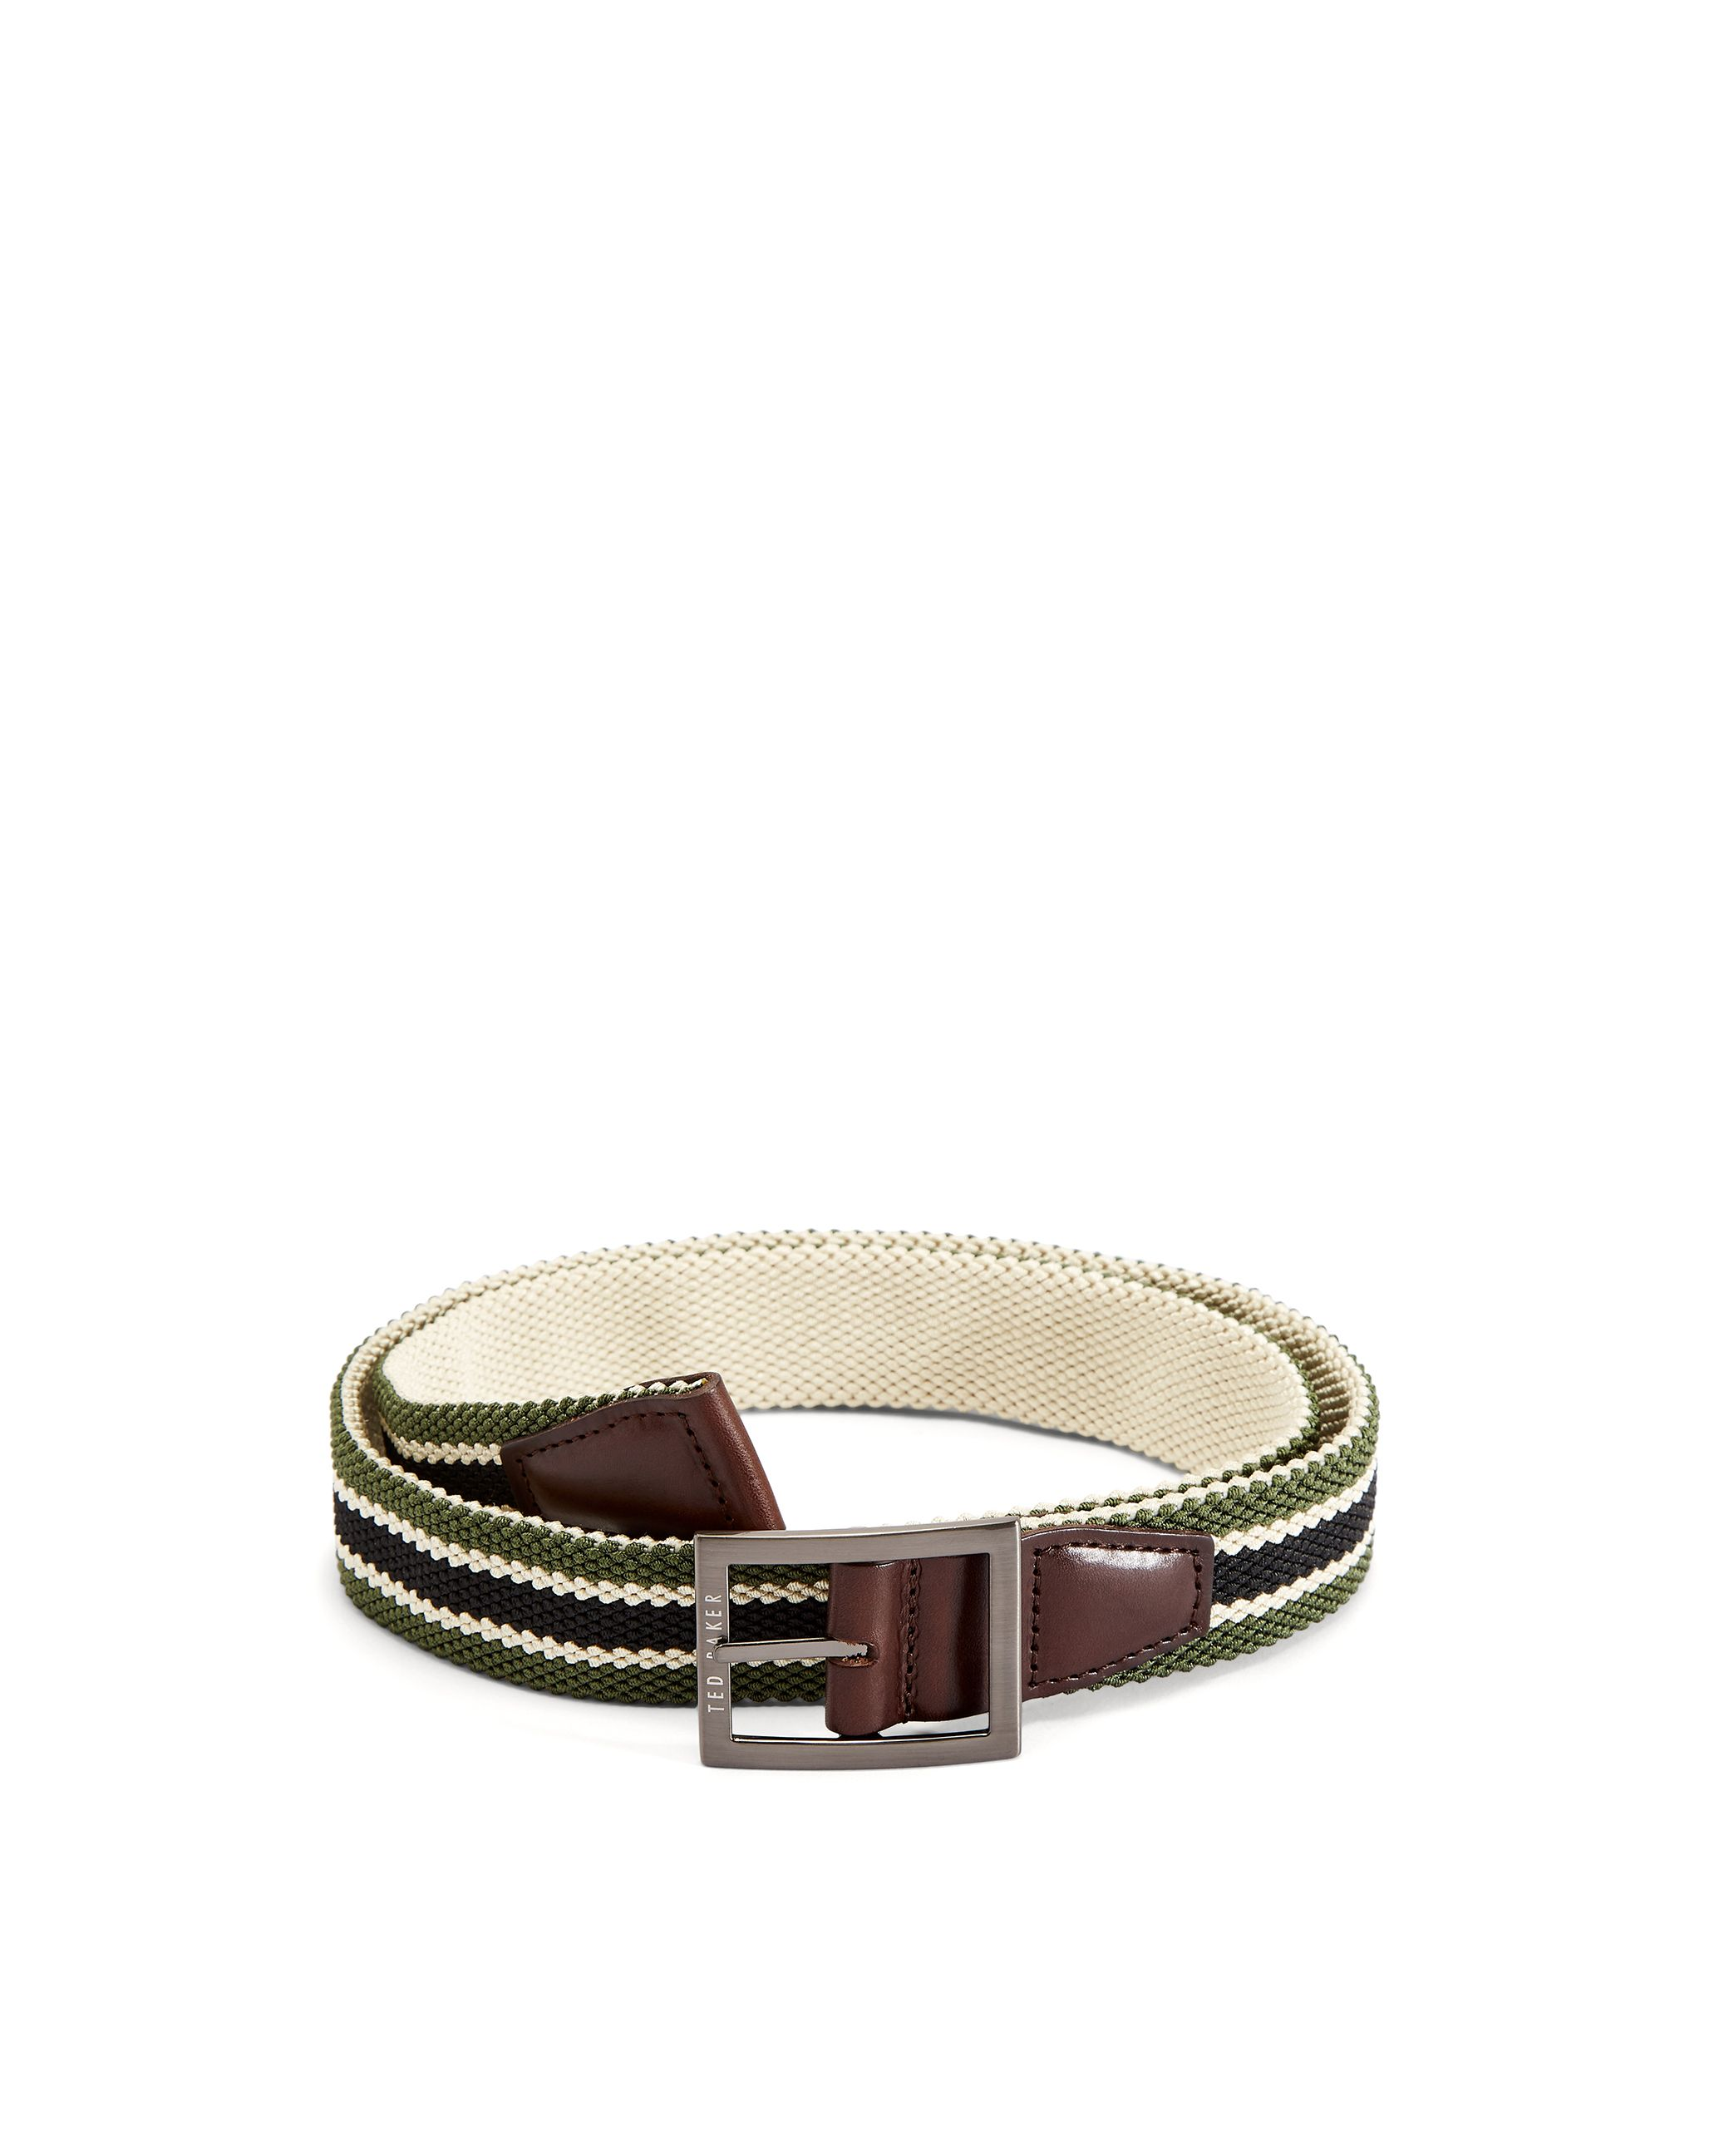 Ted Baker Greep Reversible Elastic Belt, Olive